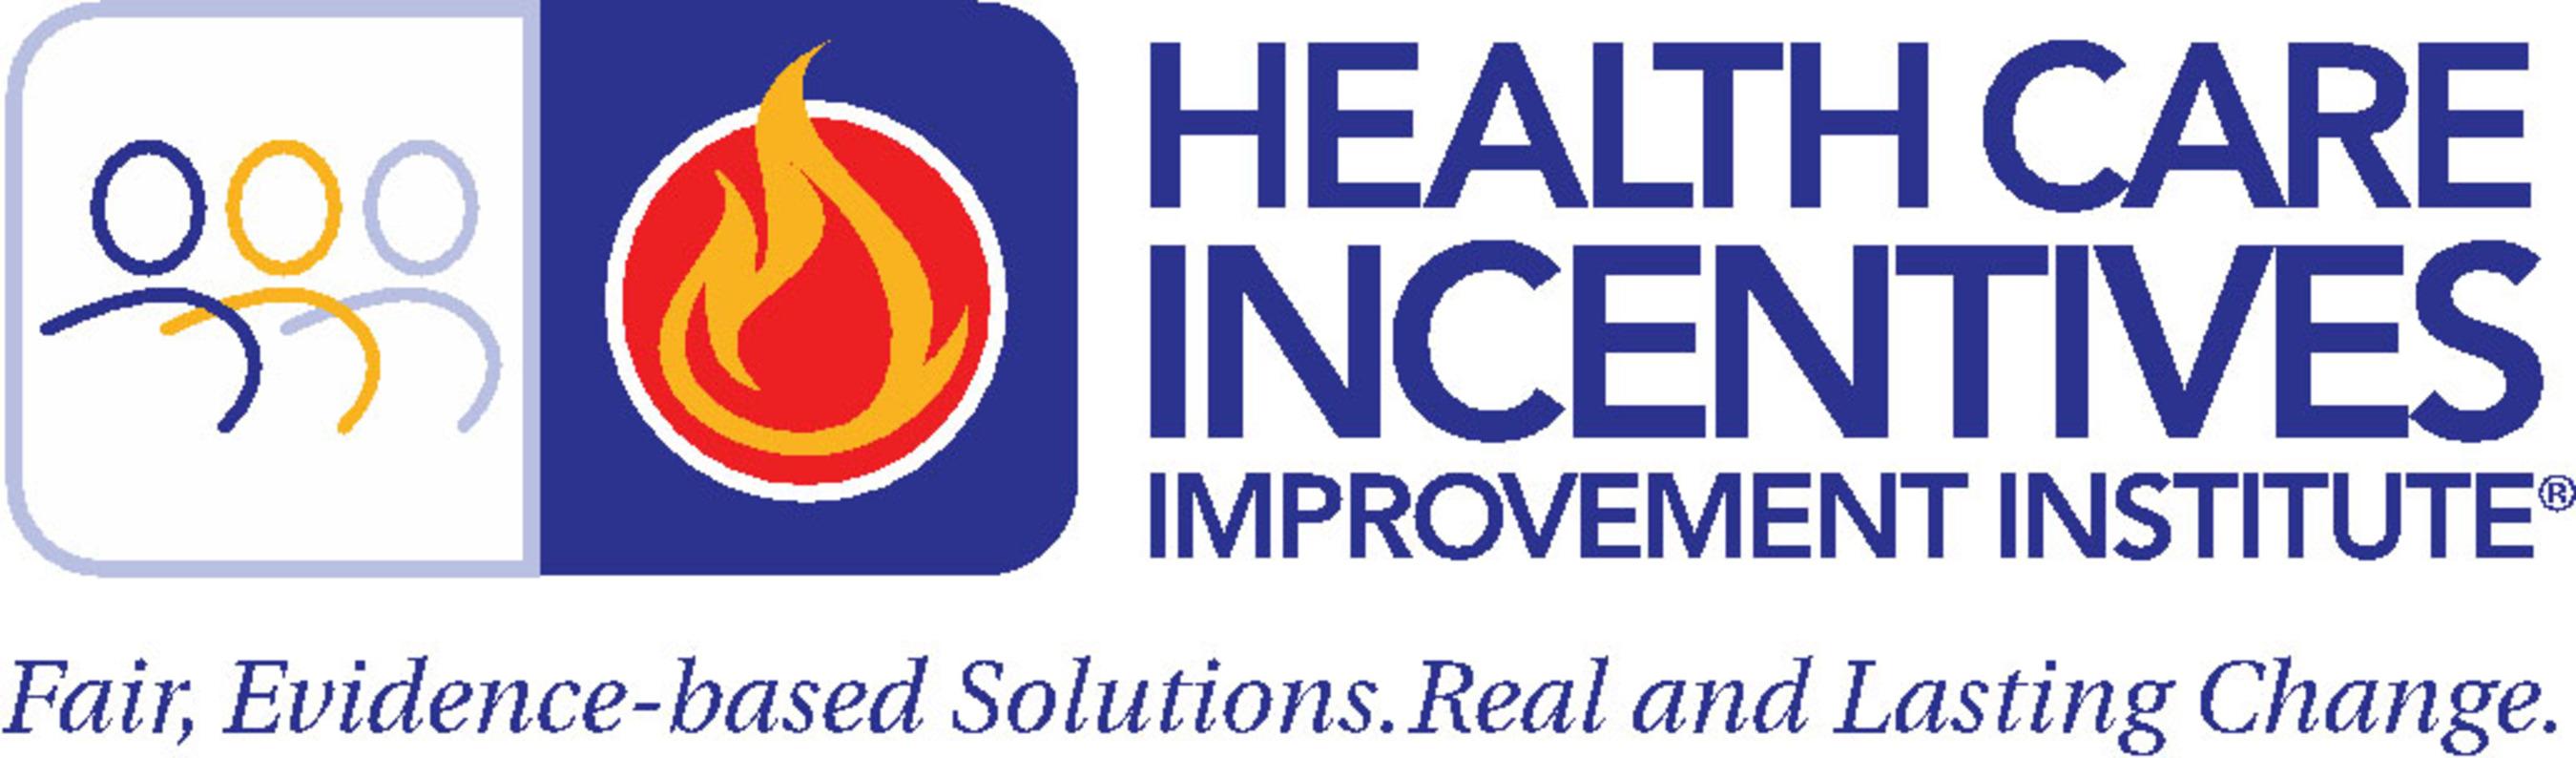 Health Care Incentives Improvement Institute